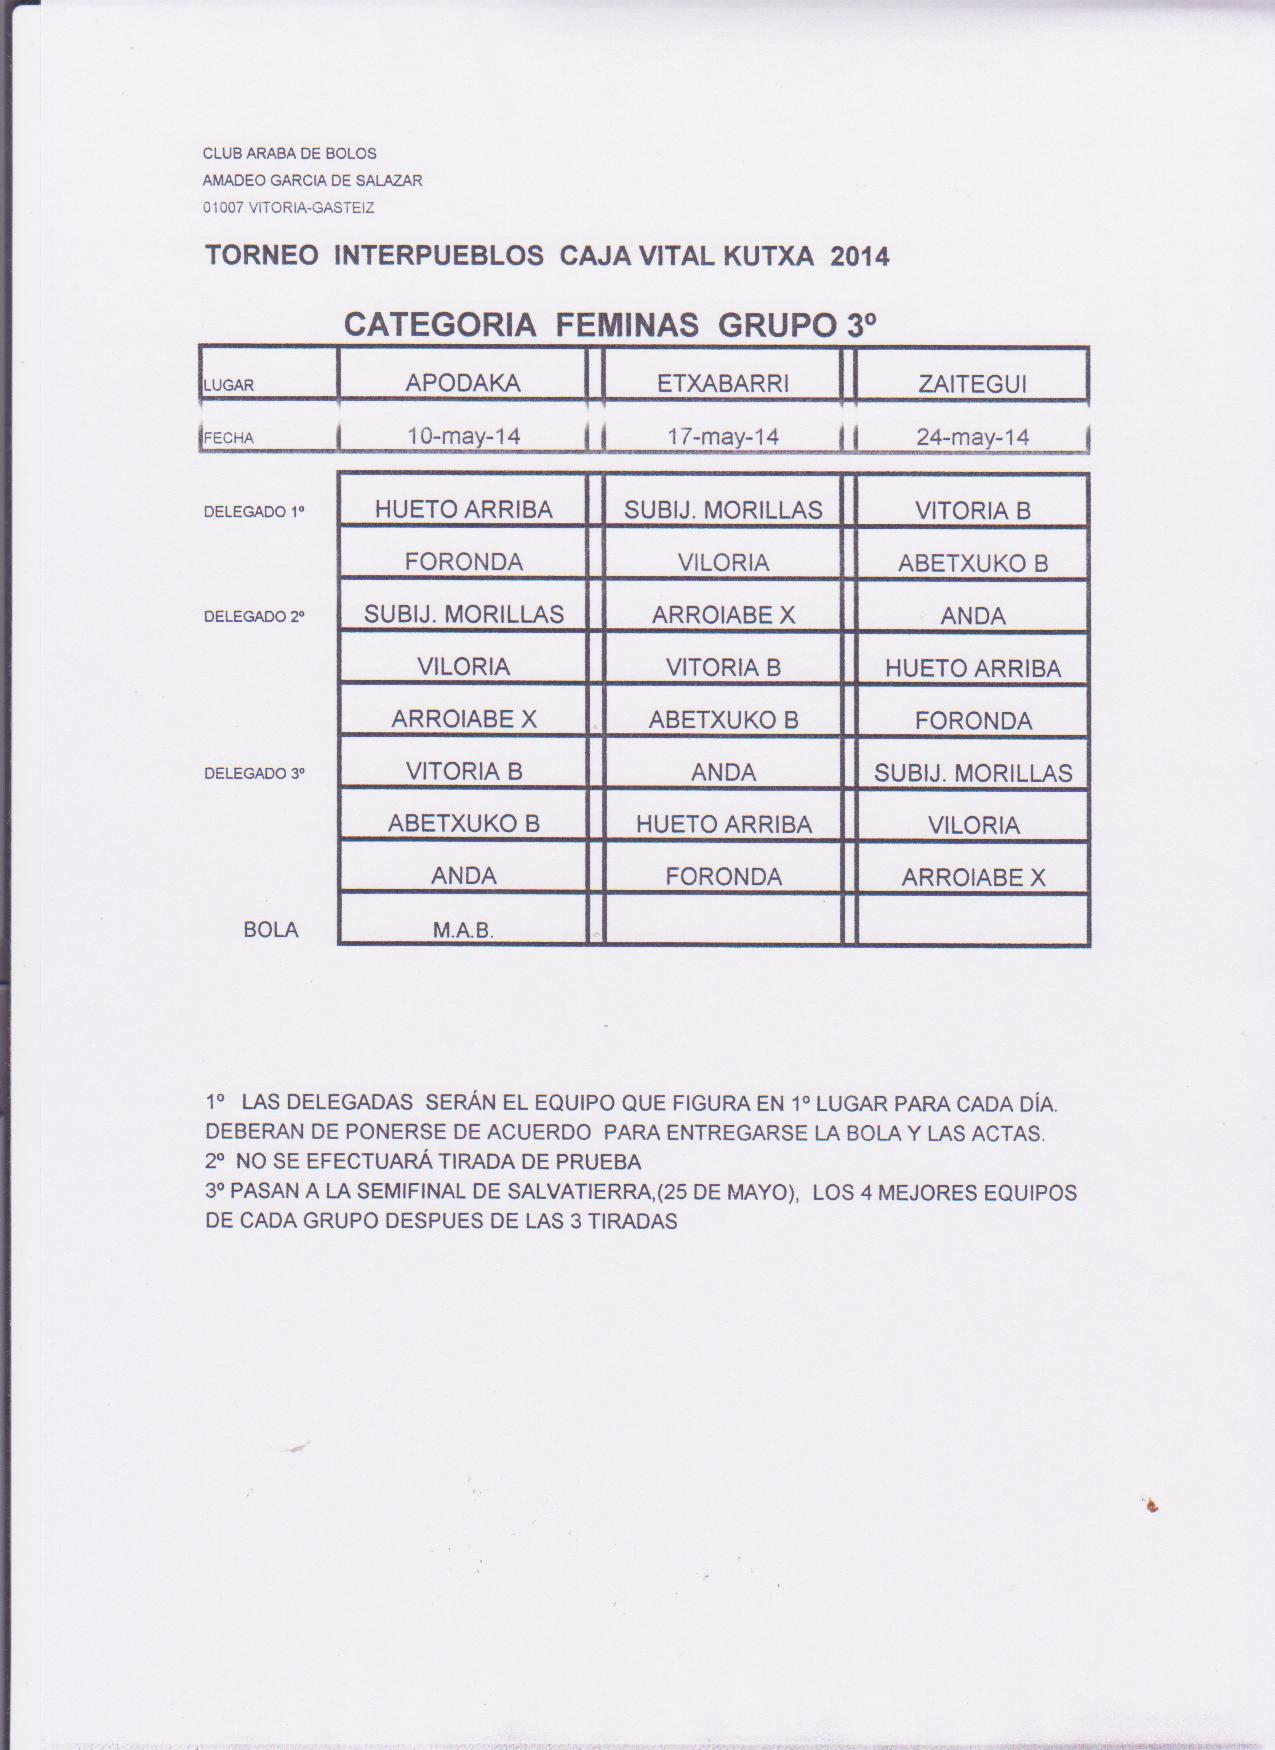 Sorteo interpueblos femenino 2014 3